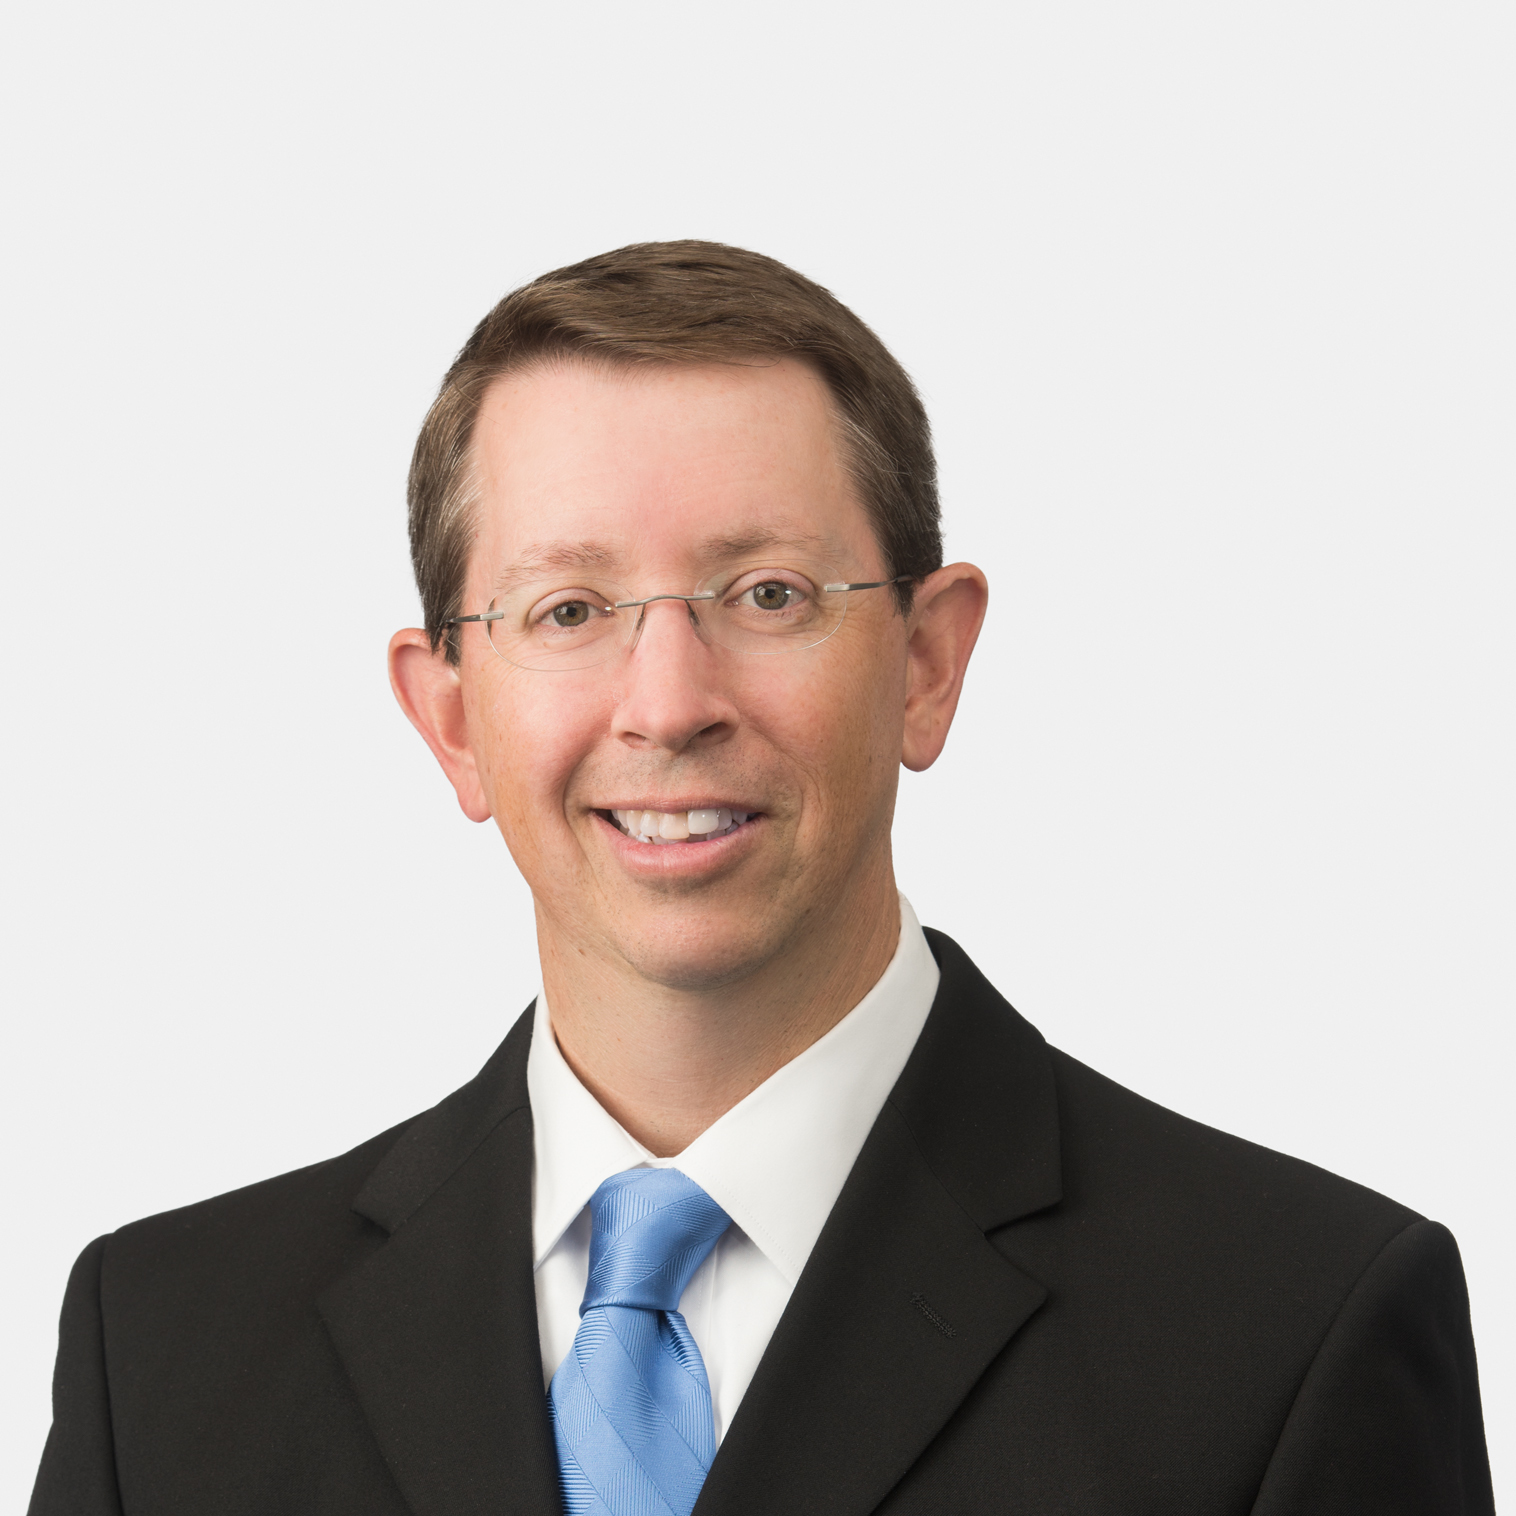 Matthew A. Barnes